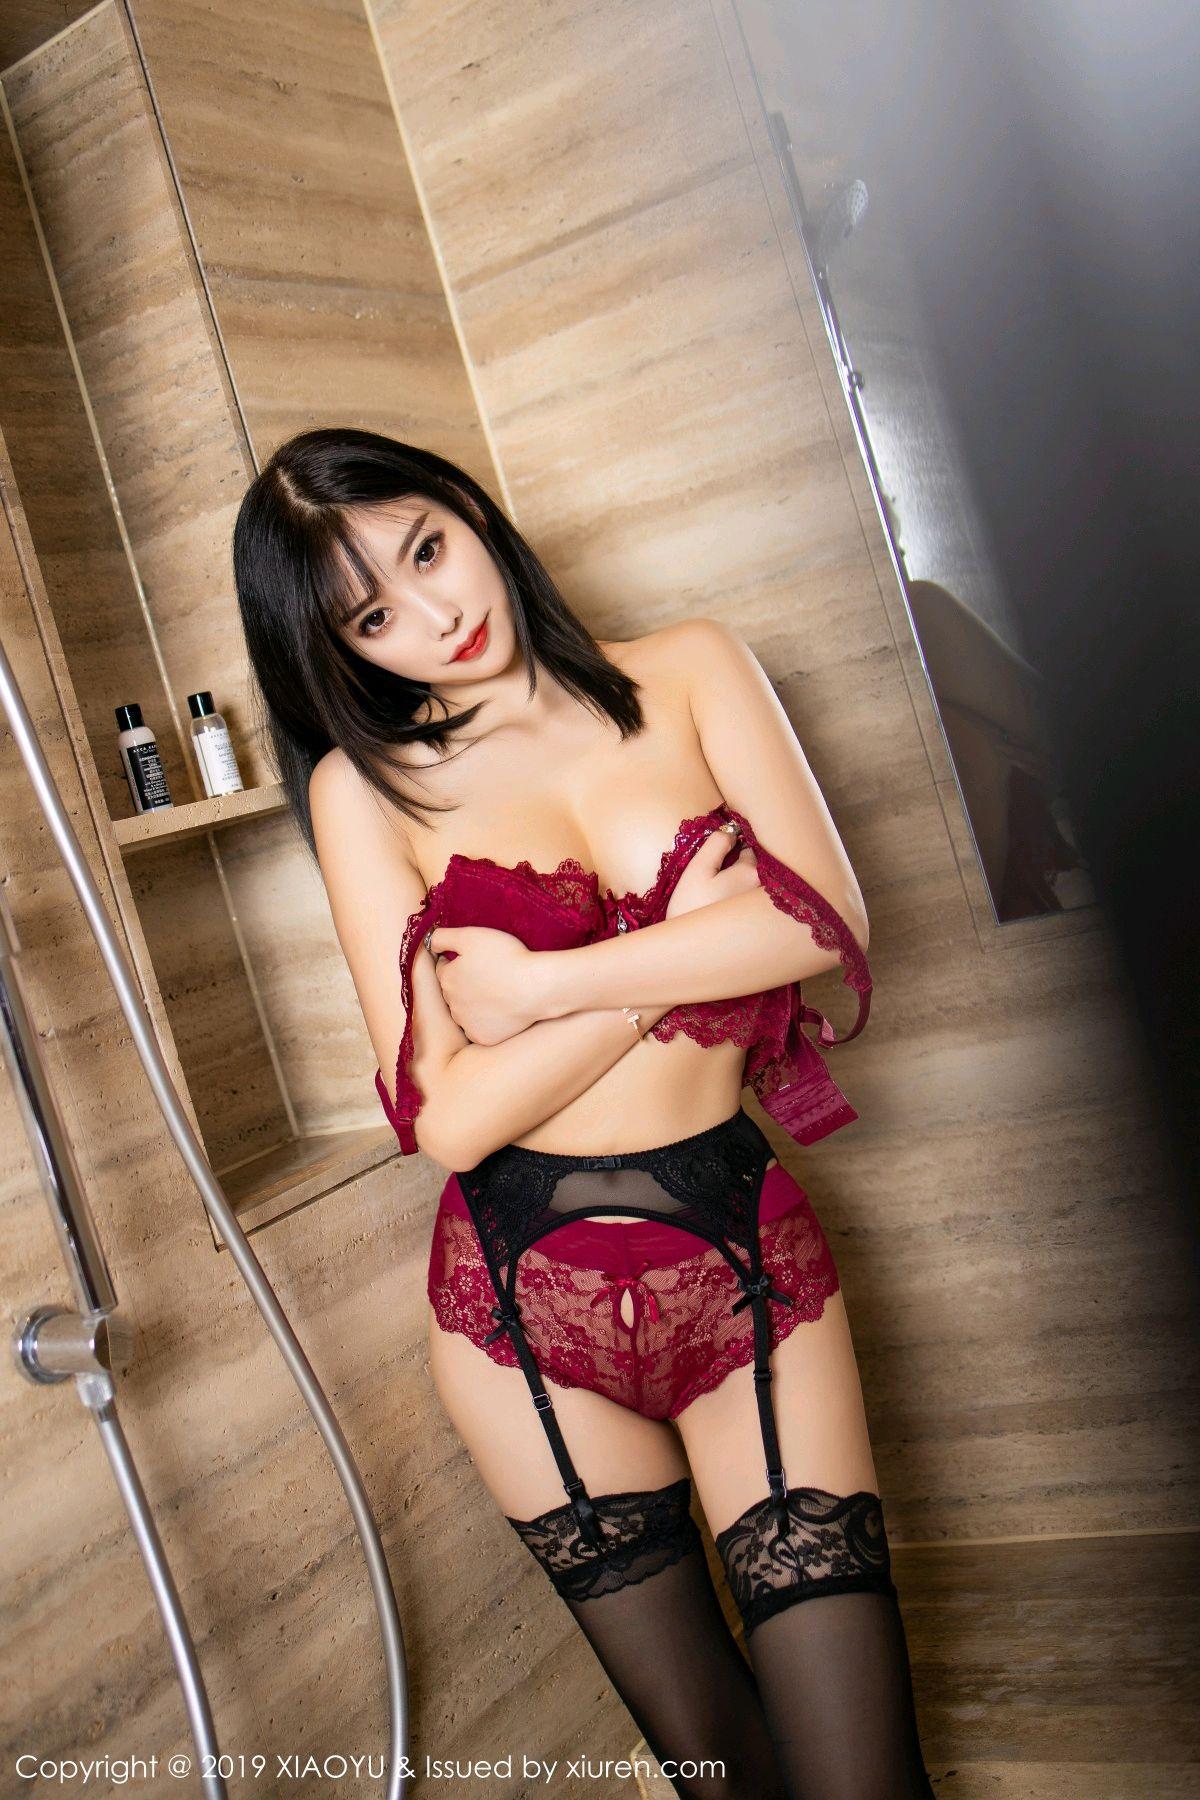 [XiaoYu] Vol.153 Yang Chen Chen 73P, Bathroom, Black Silk, Underwear, XiaoYu, Yang Chen Chen